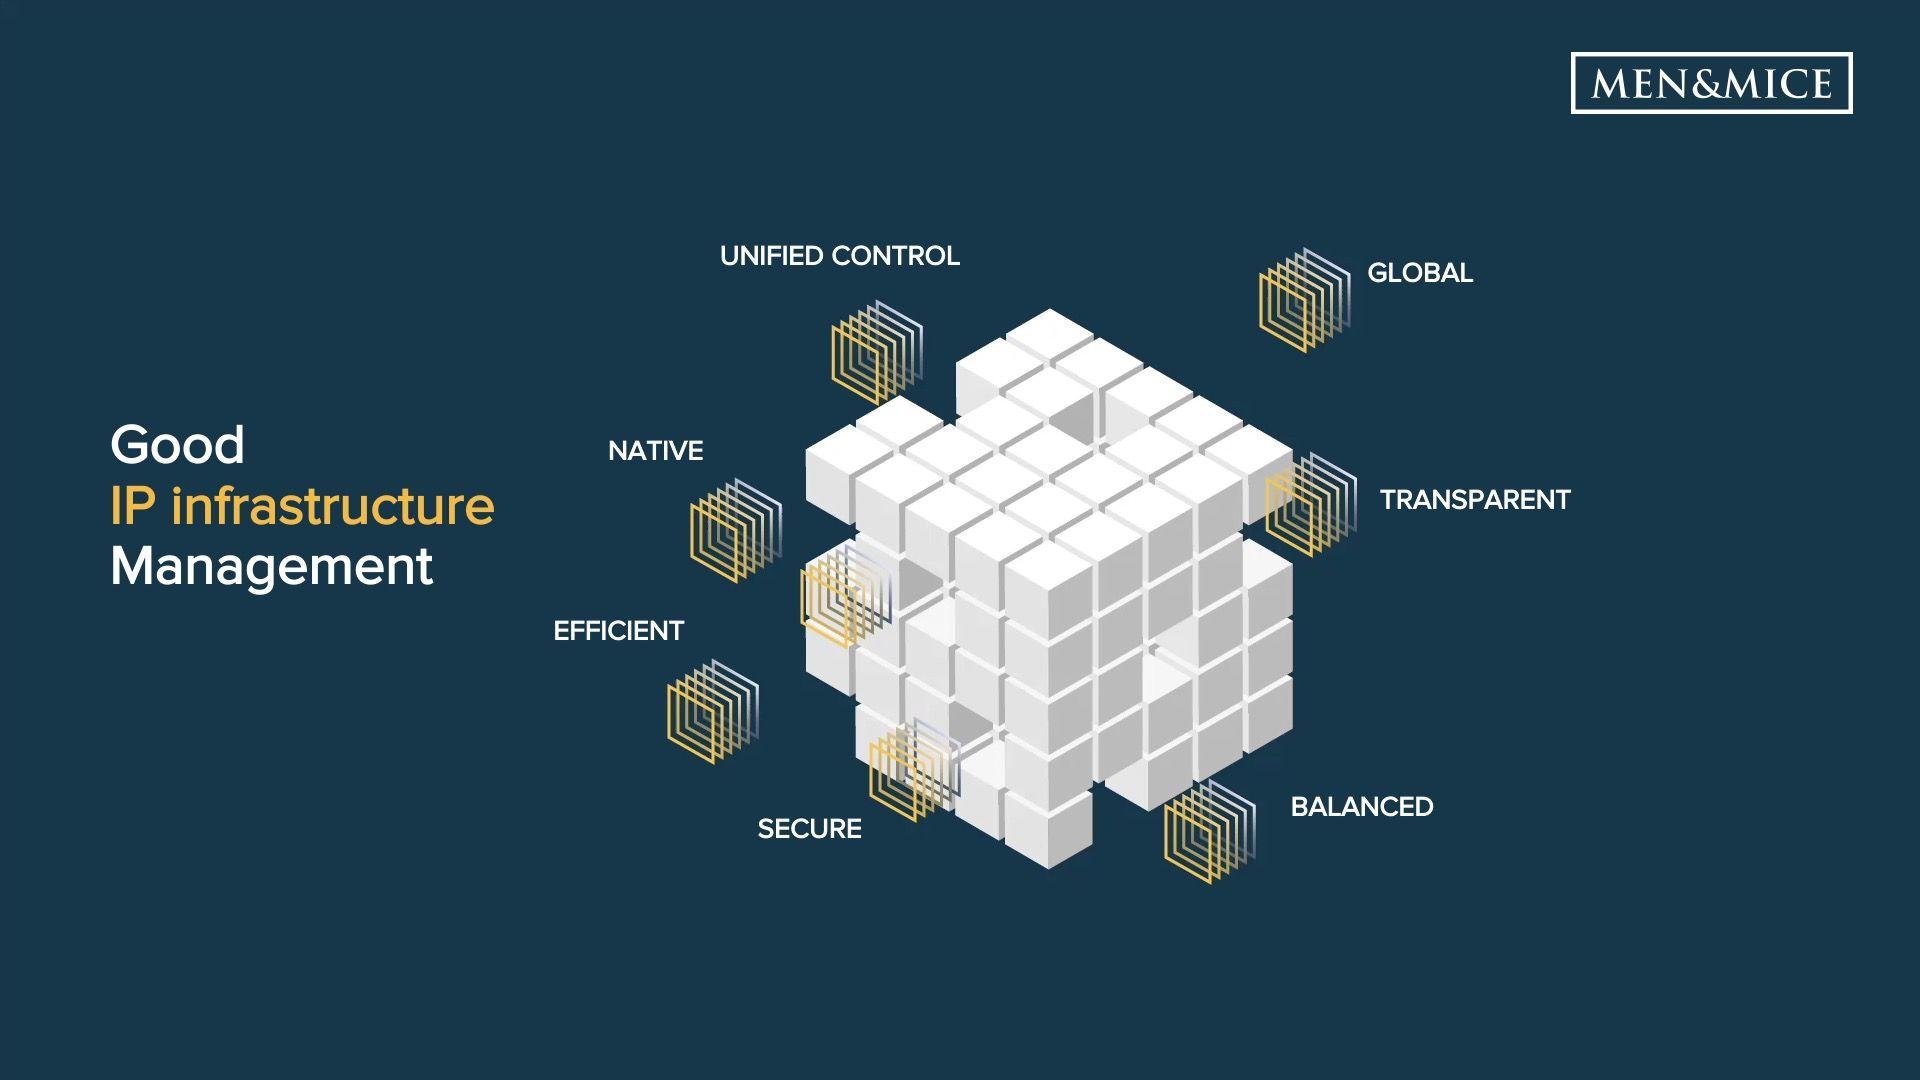 Compound network management